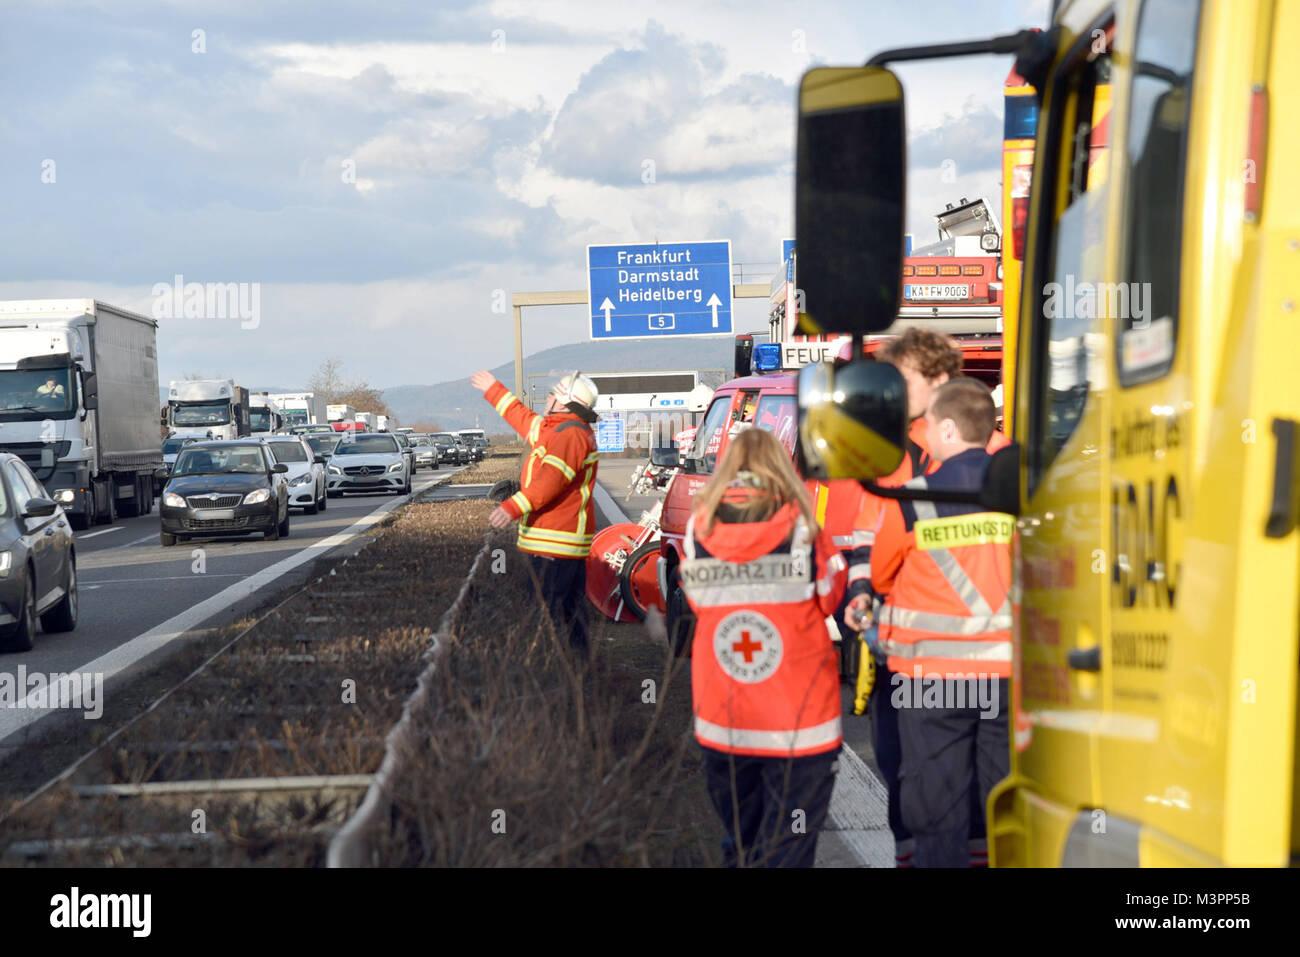 St. Leon-Rot, Deutschland. 12 Feb, 2018. Rettungsmannschaften ...